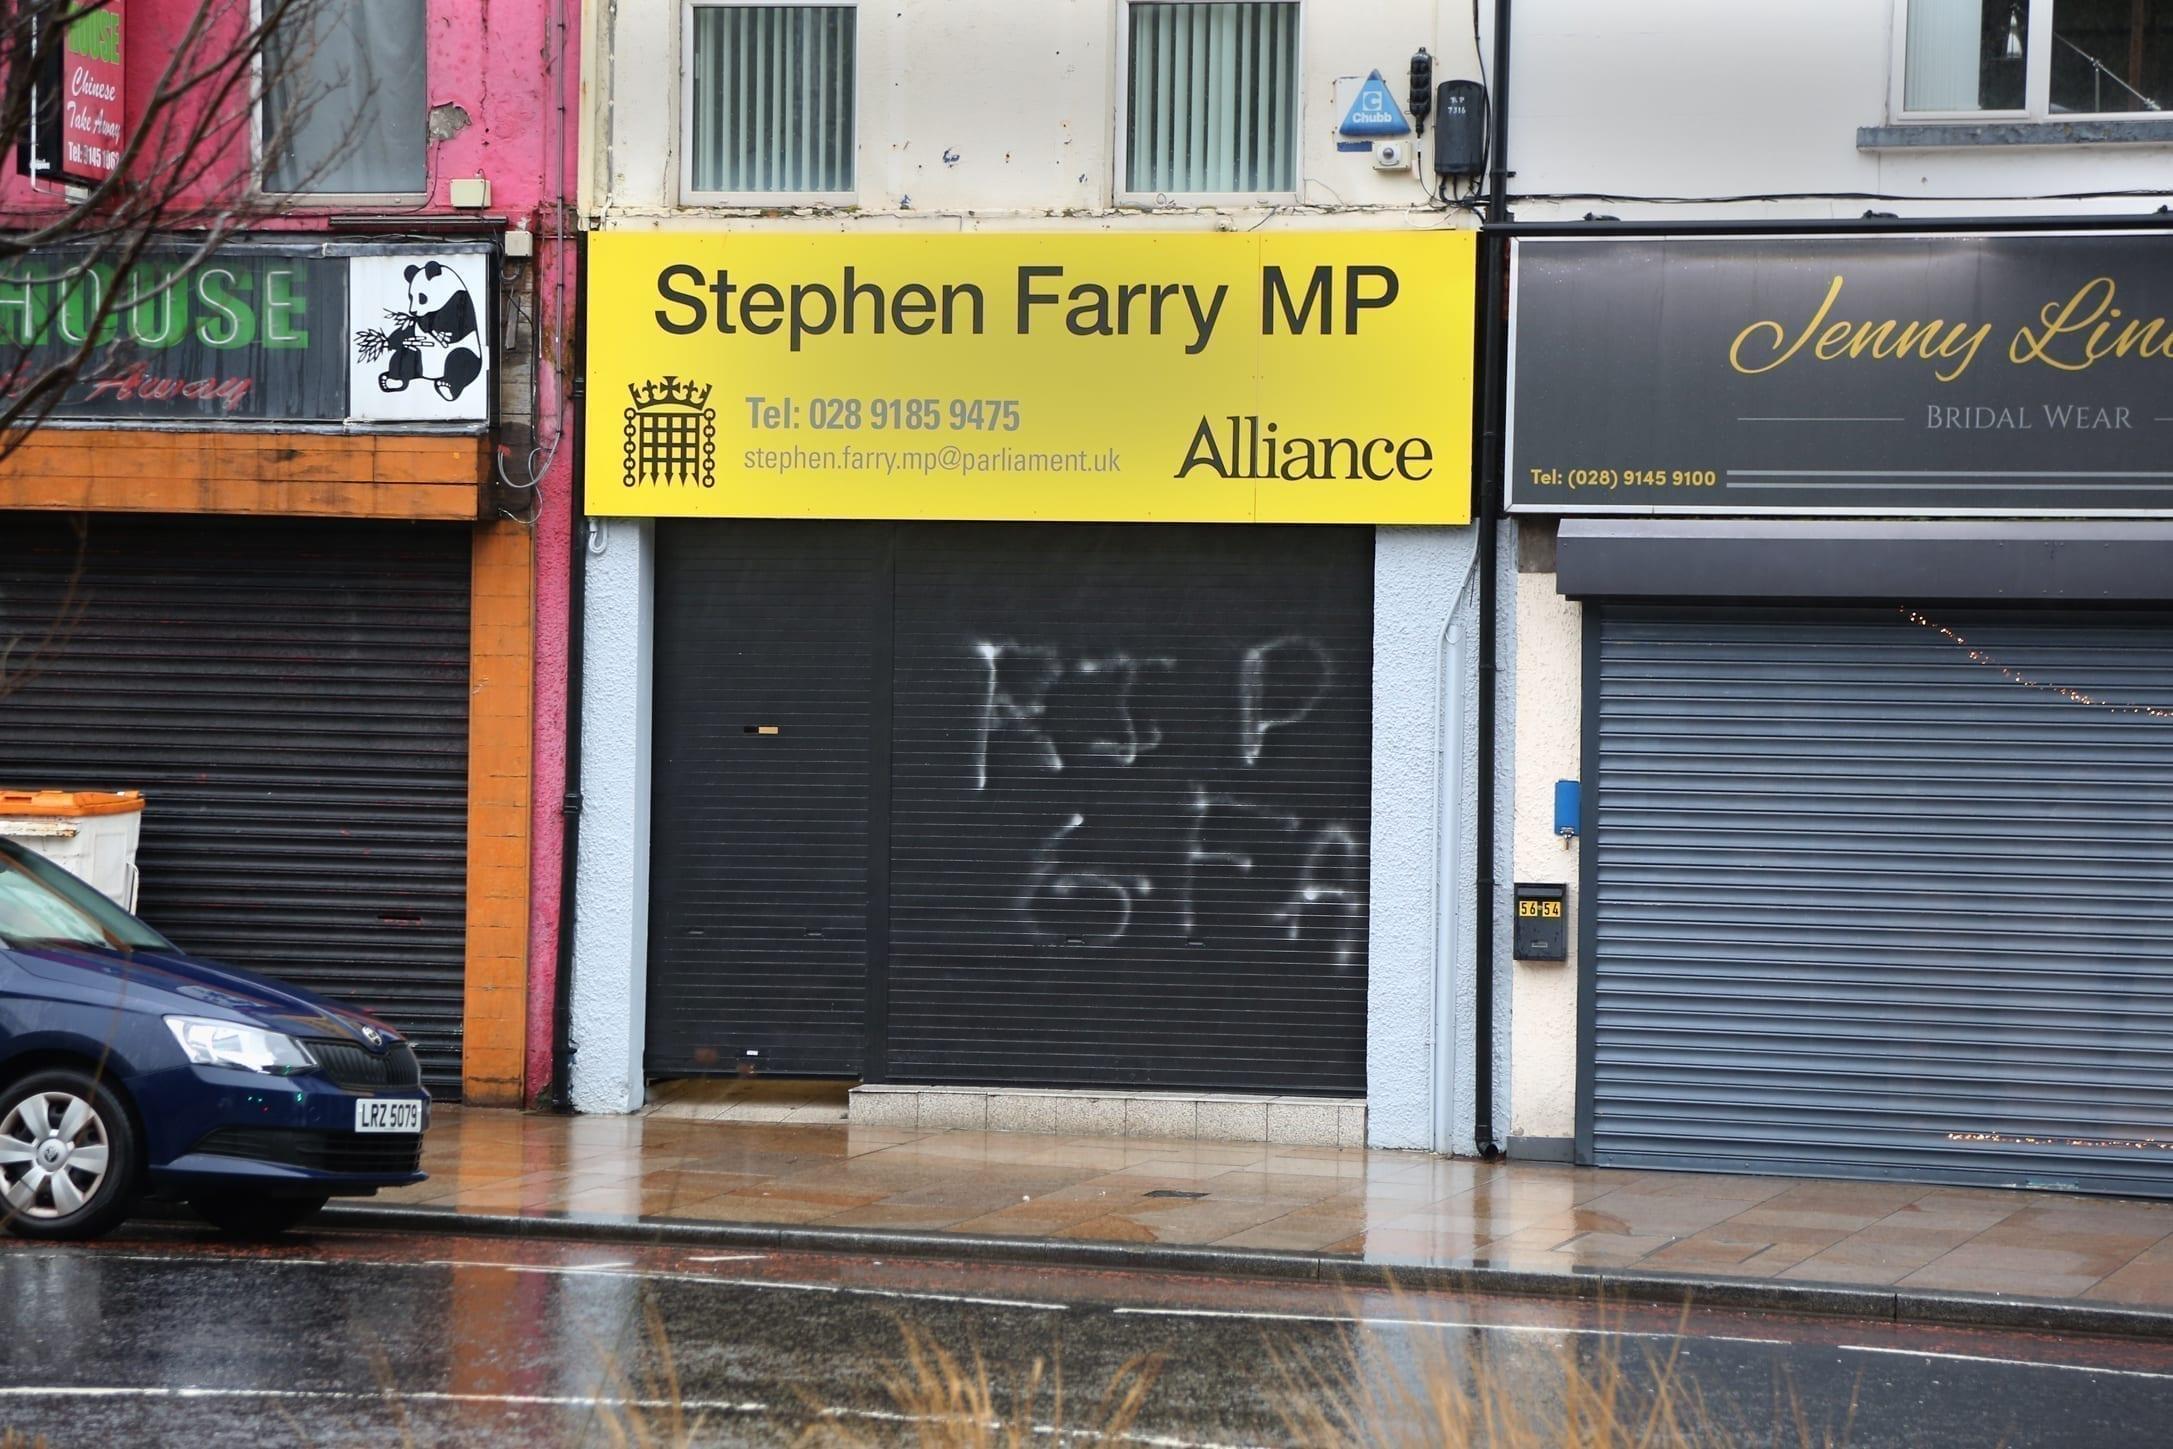 Graffiti attacks denounced on local offices